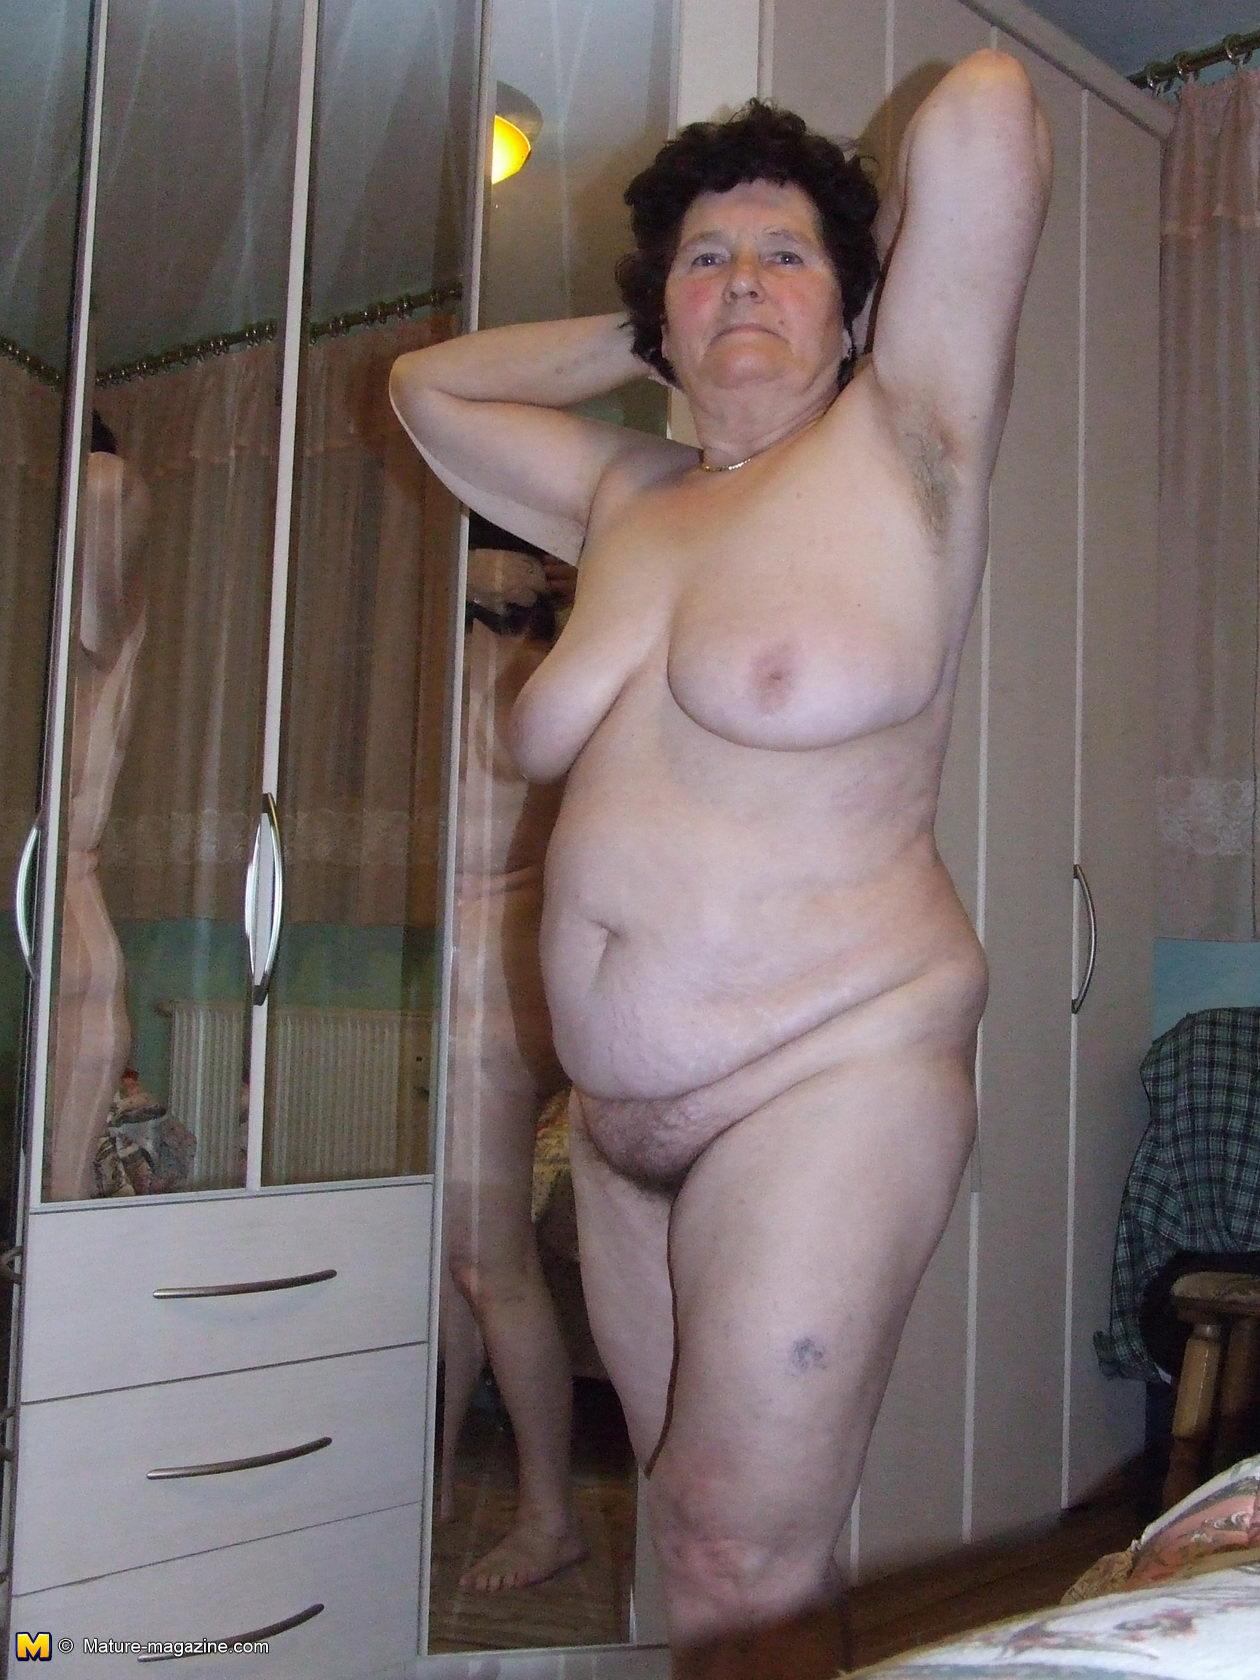 hildegard nackt